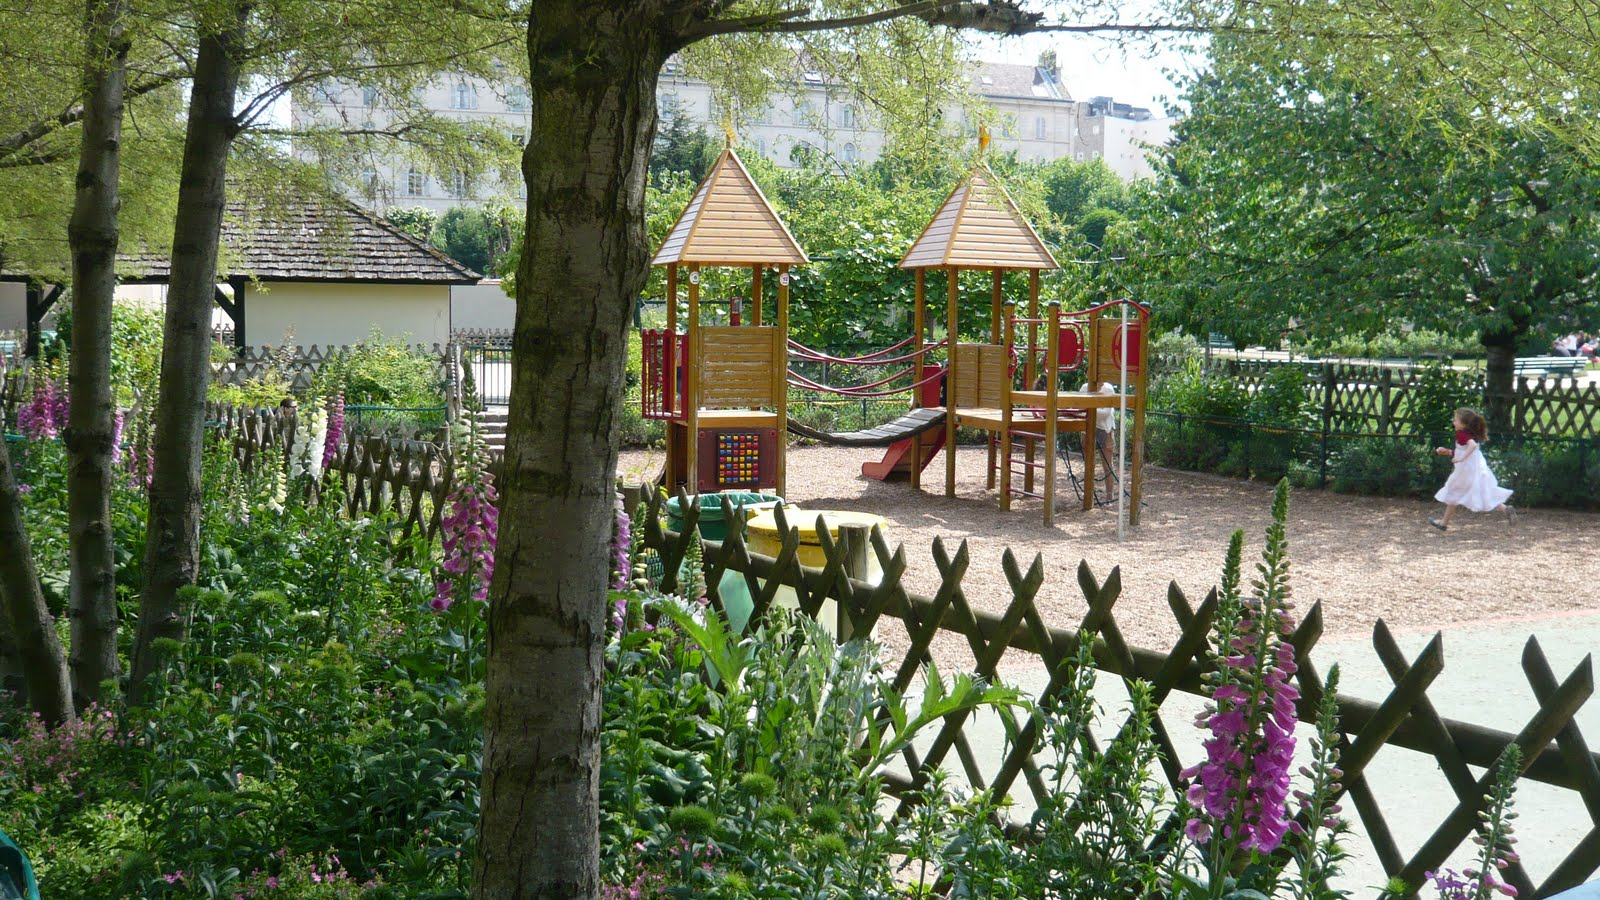 Jardin catherine labour 7 me paris yelp for Jardin catherine laboure